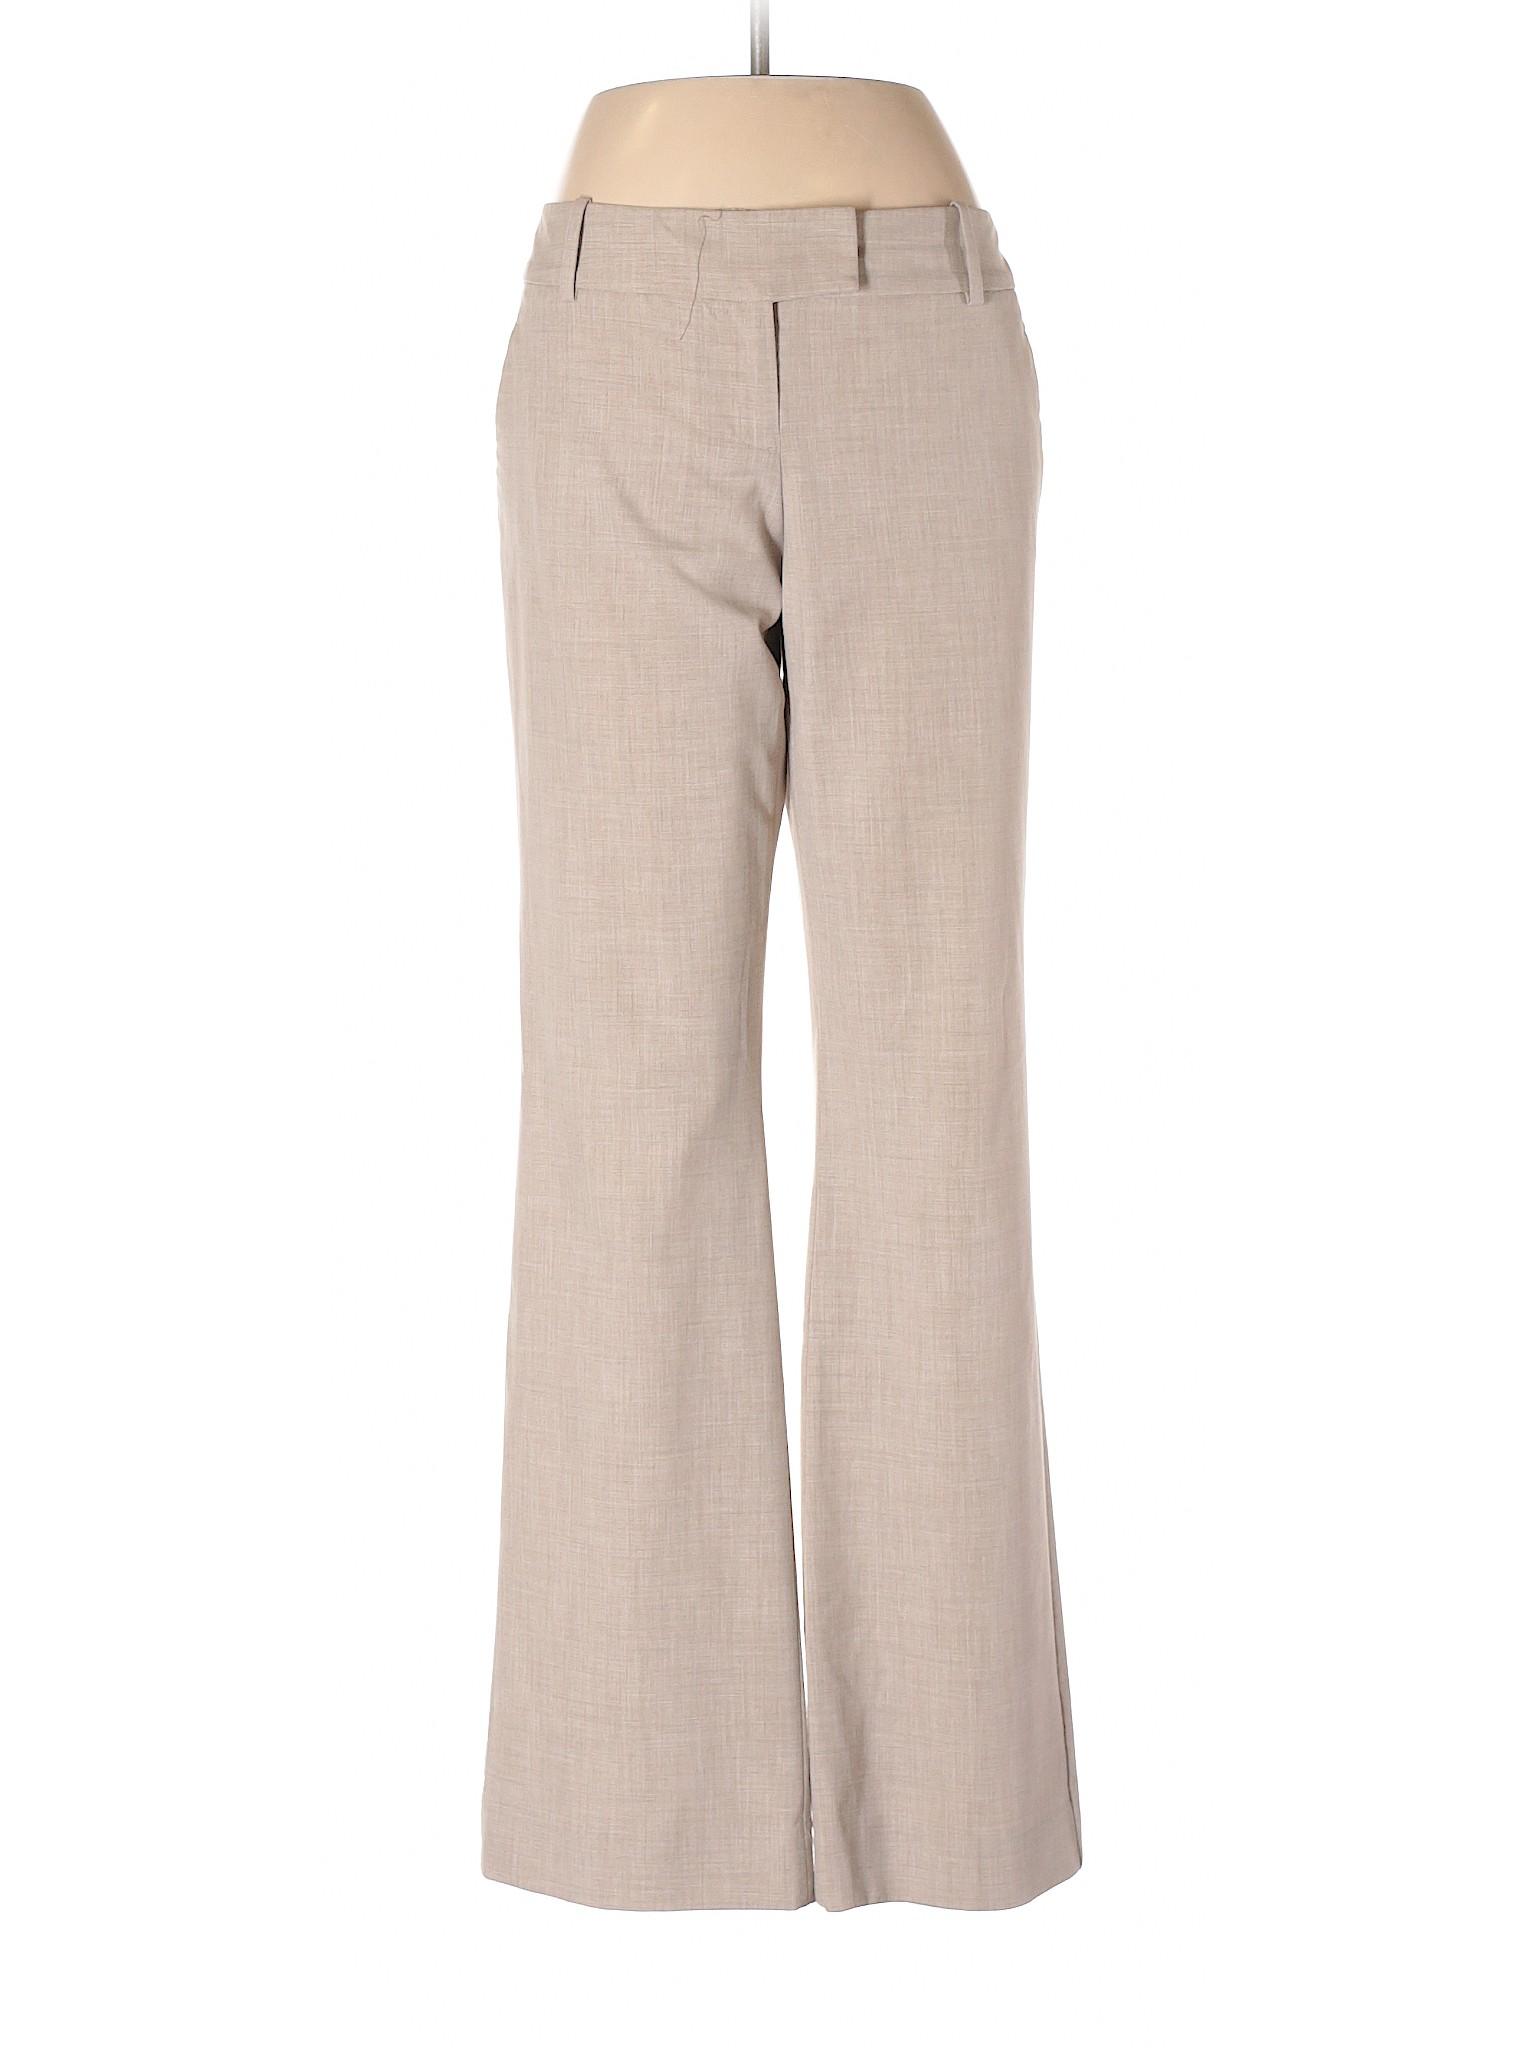 Boutique Boutique Pants Limited The The Dress vxw6pP6B